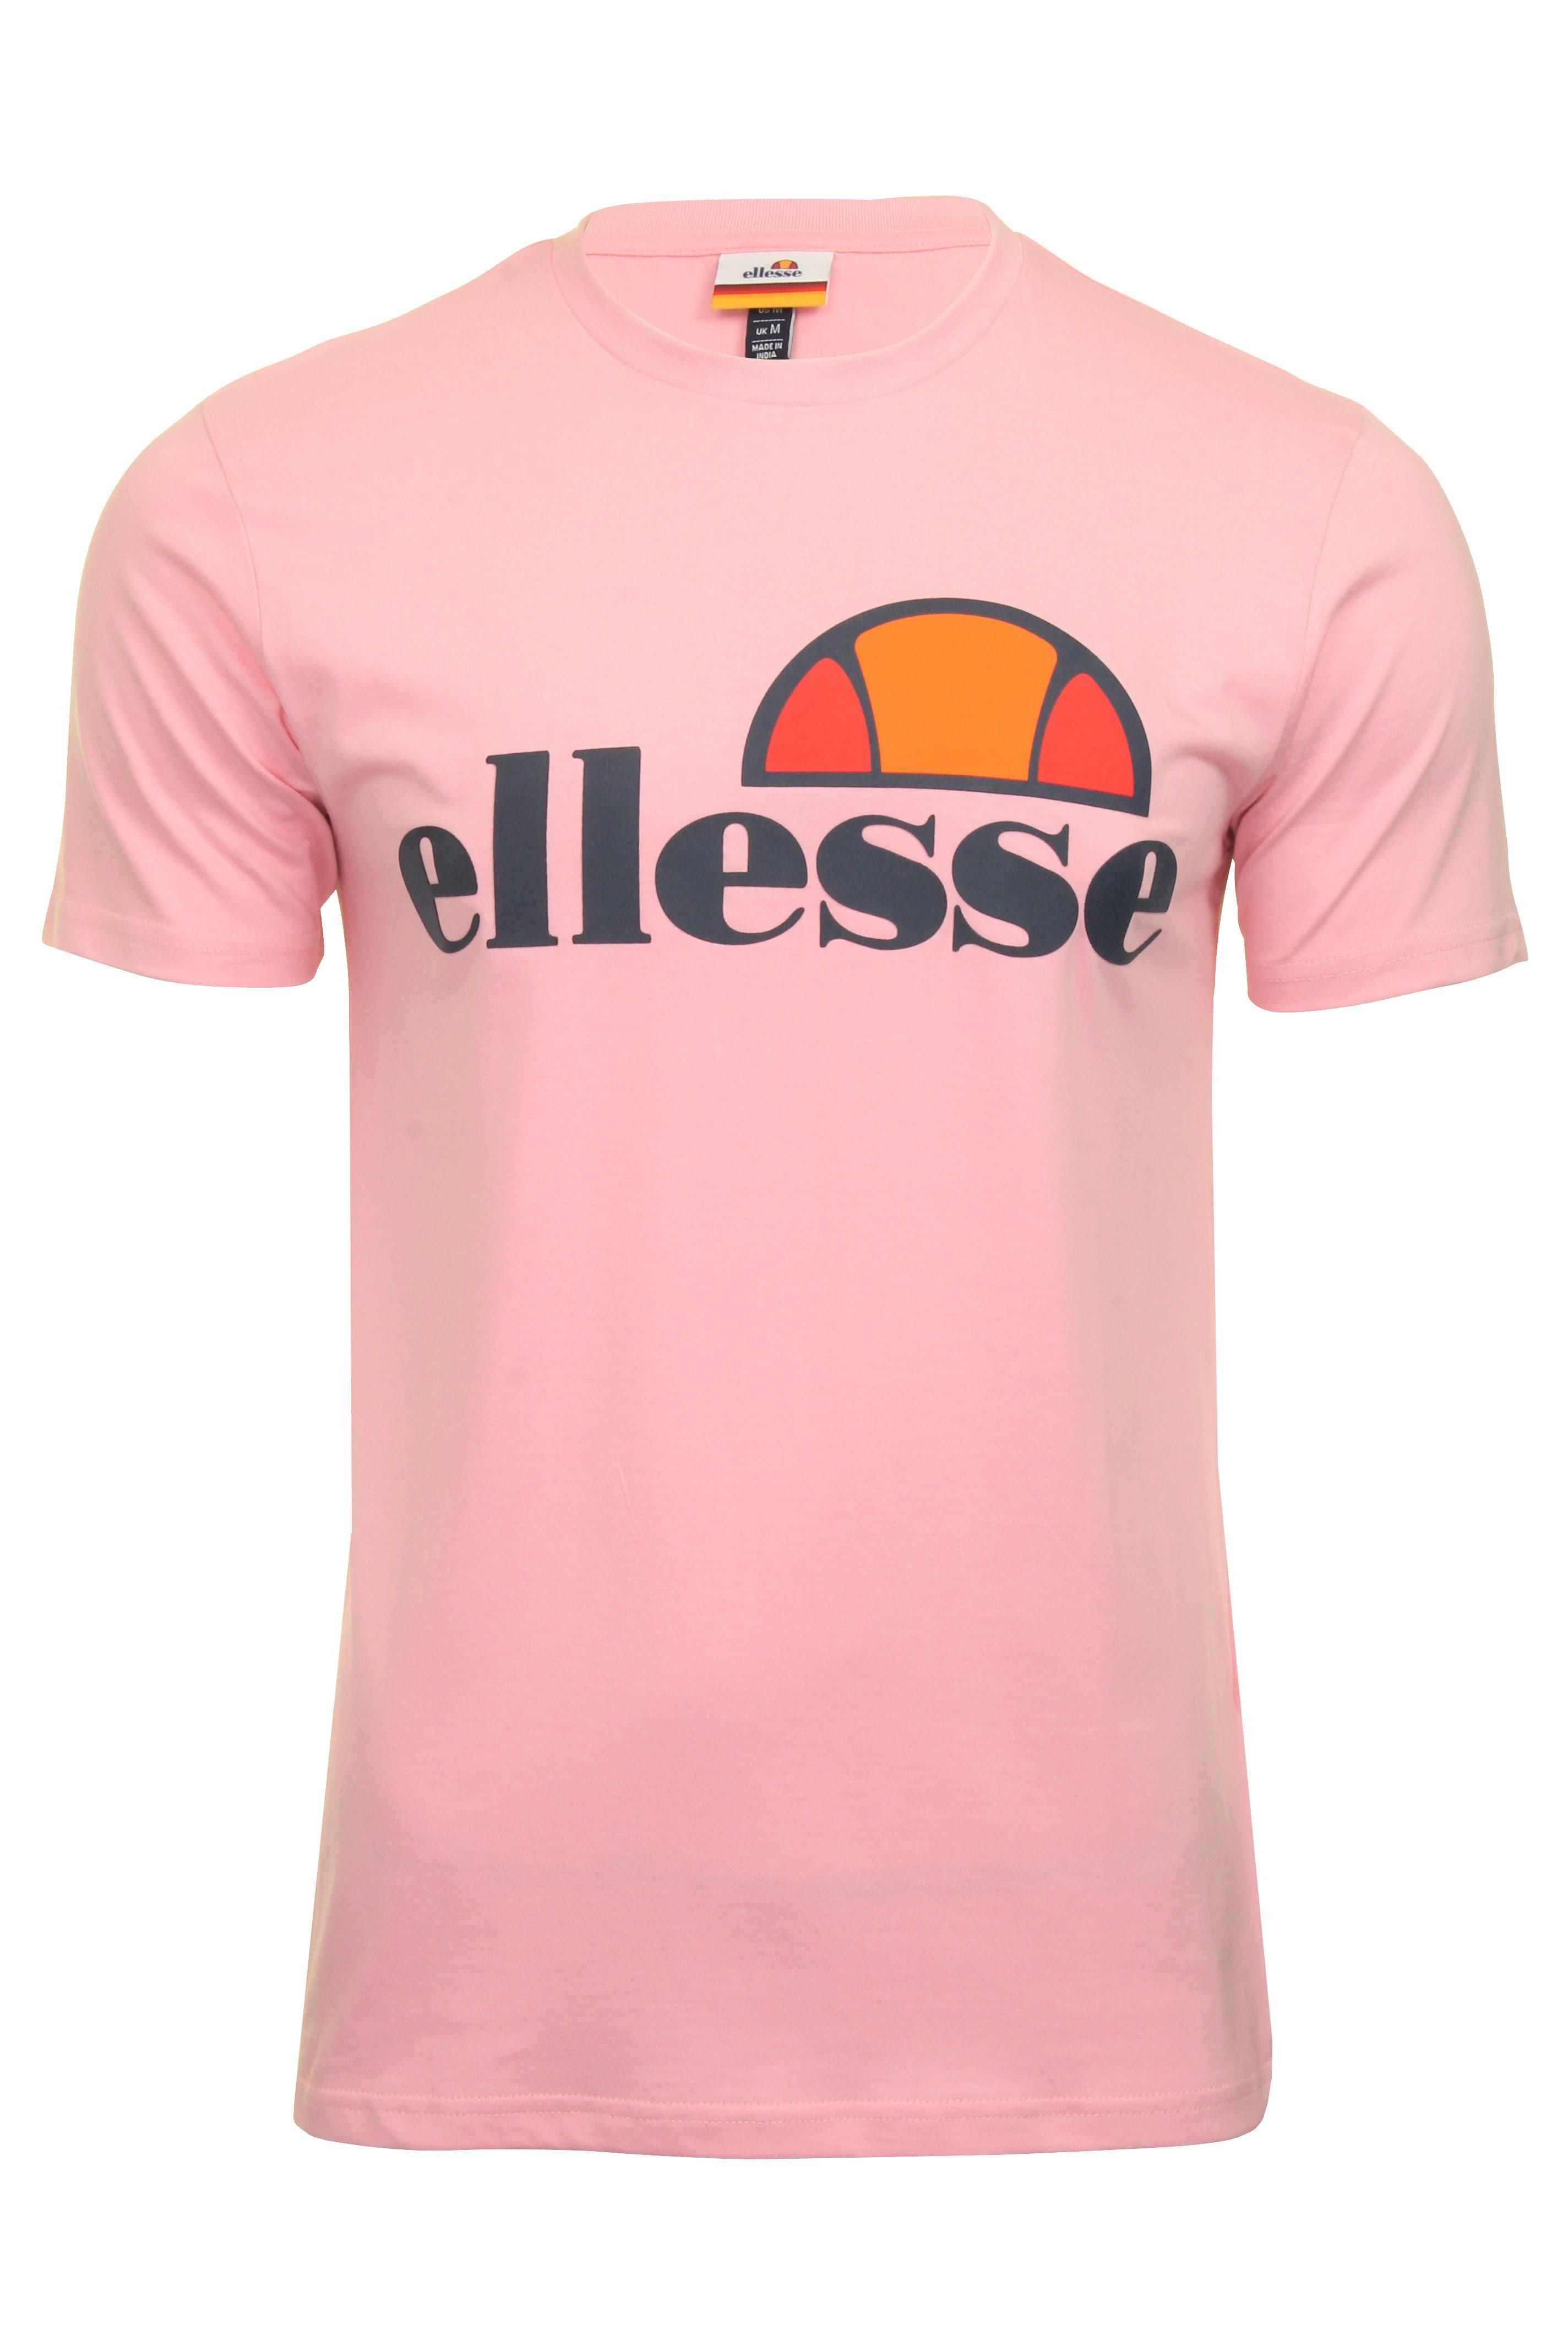 Prado Camiseta Heritage Tamaño Sha01147 Xl Color Rosa Ellesse Rosa rrSqZEUAw